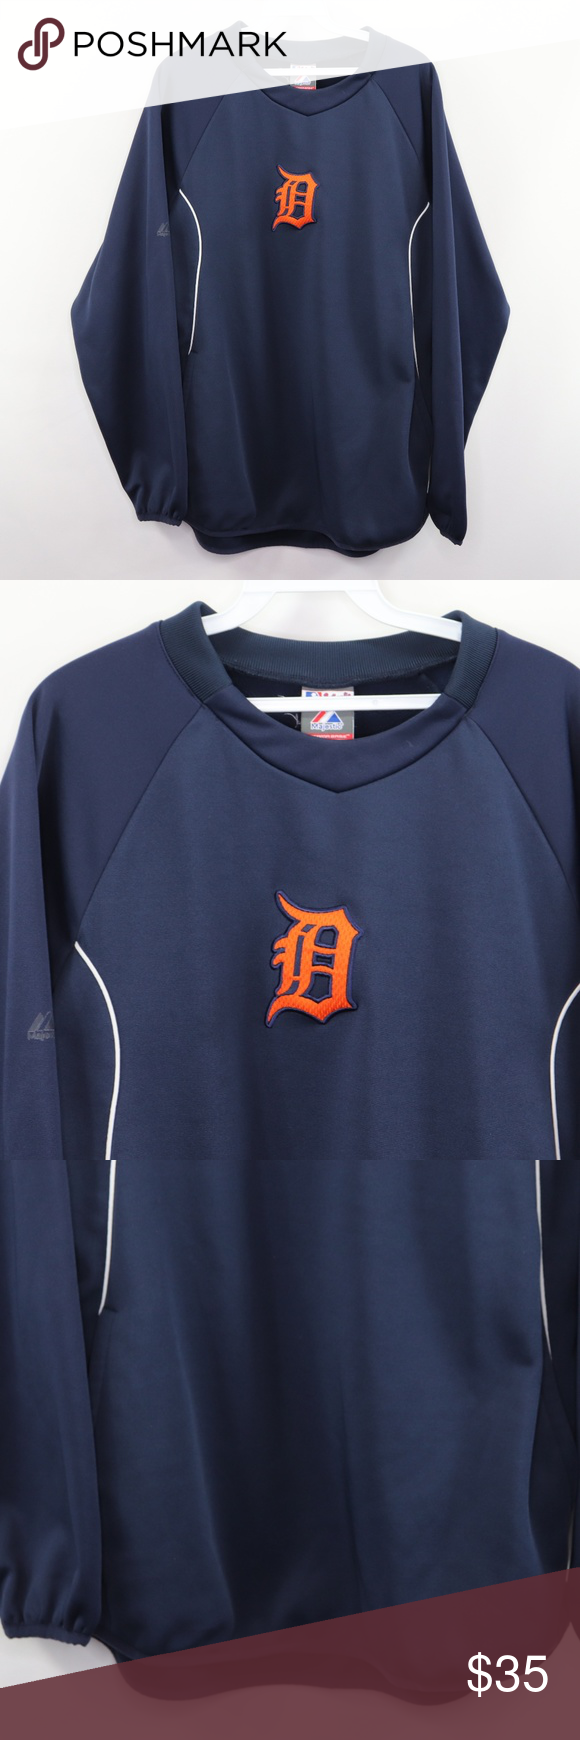 Majestic Detroit Tigers Therma Base Sweatshirt M Sweatshirts Sweaters Crewneck Crew Neck Sweatshirt [ 1740 x 580 Pixel ]